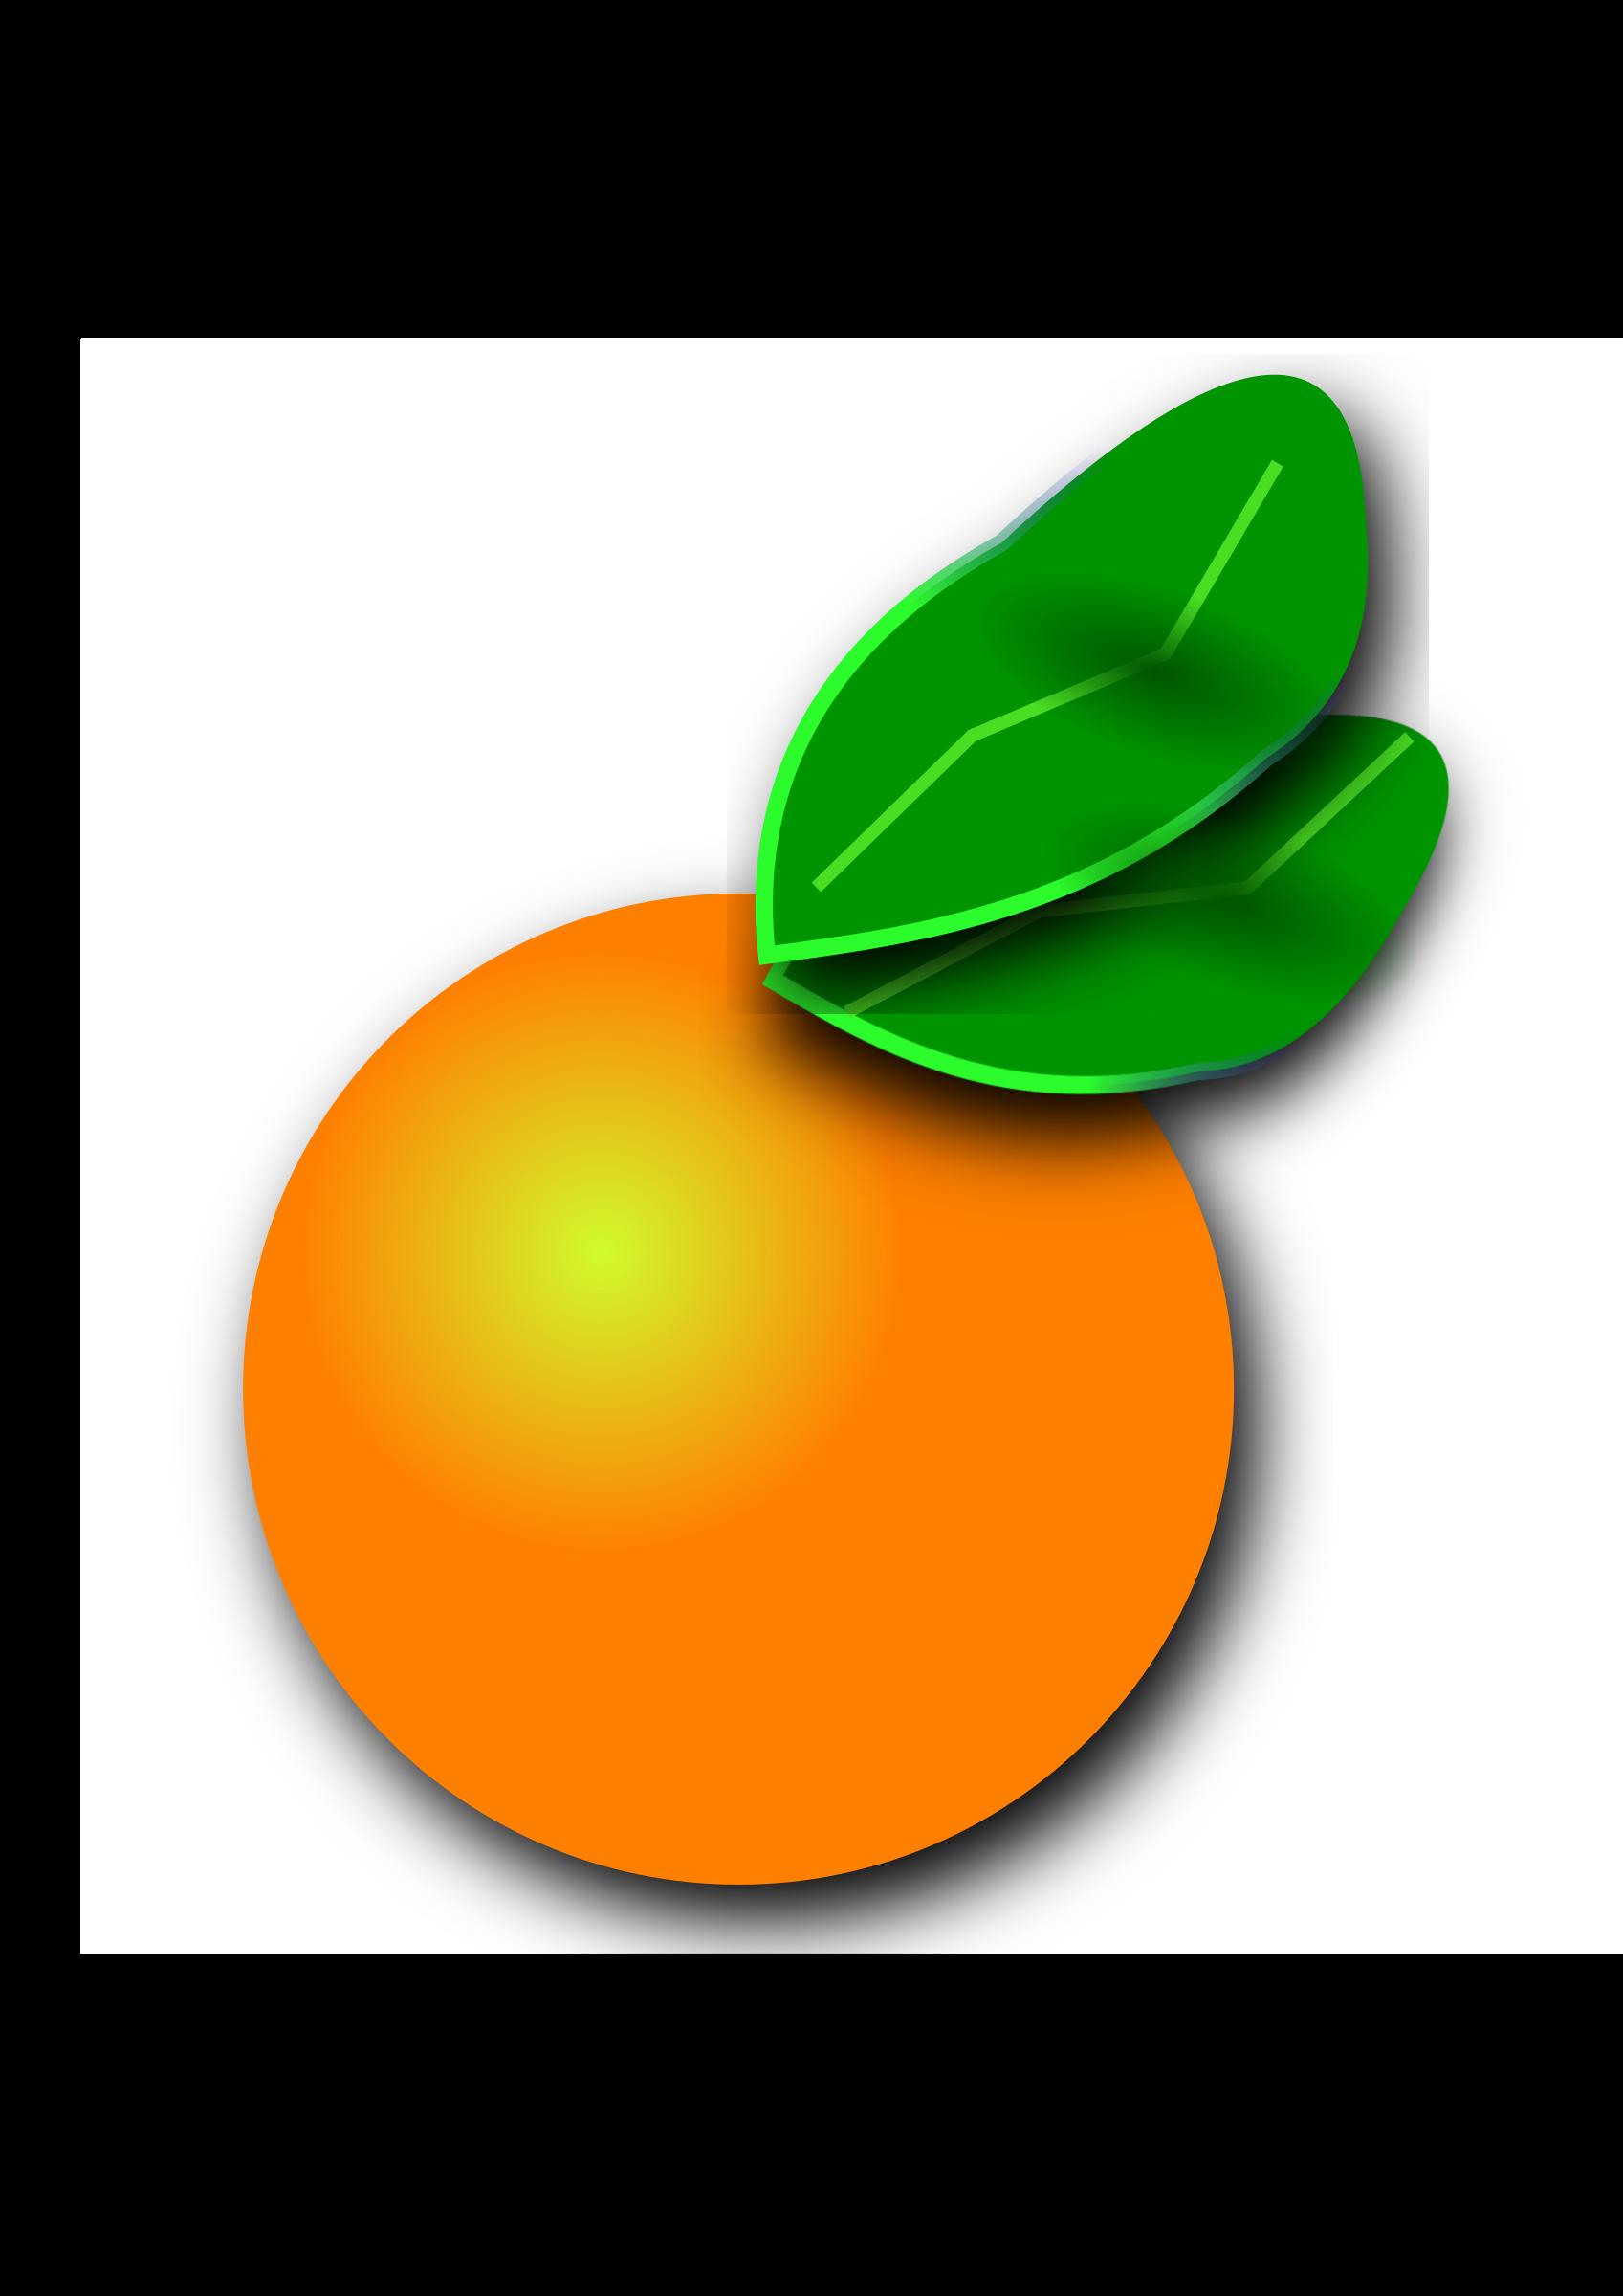 Orange citrus image png. Florida clipart big